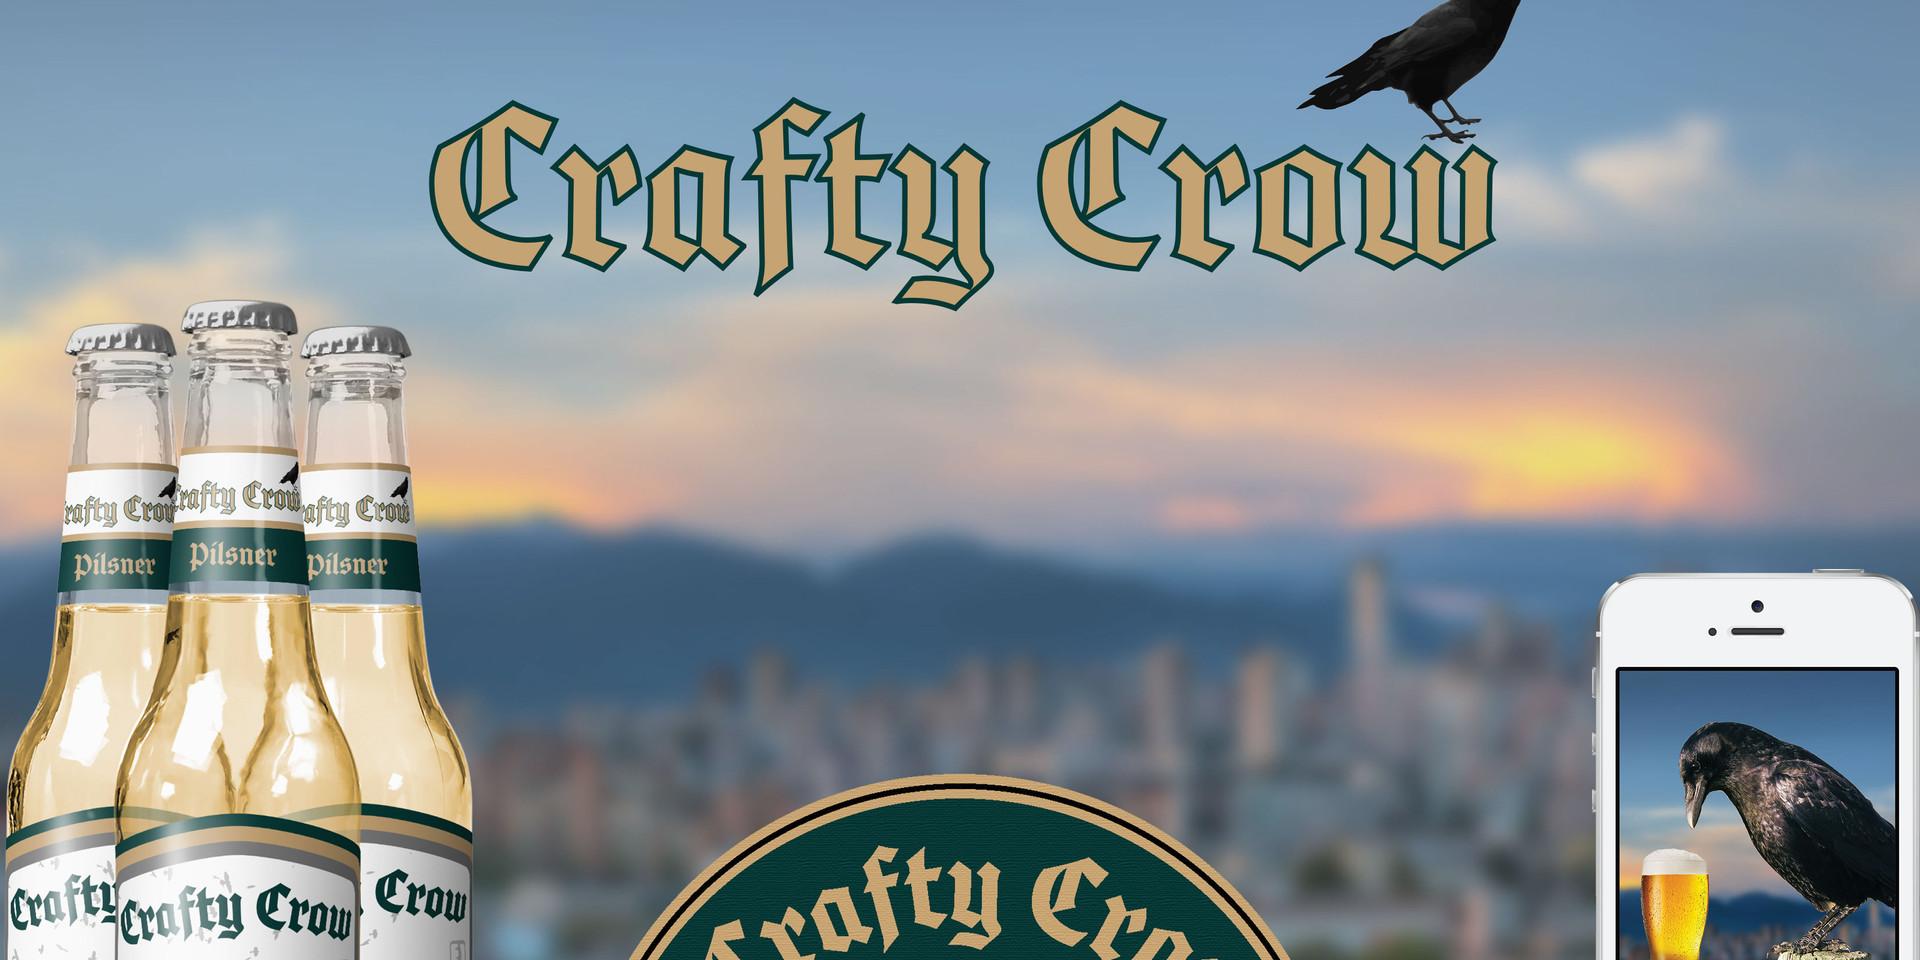 Crafty Crow Brewery